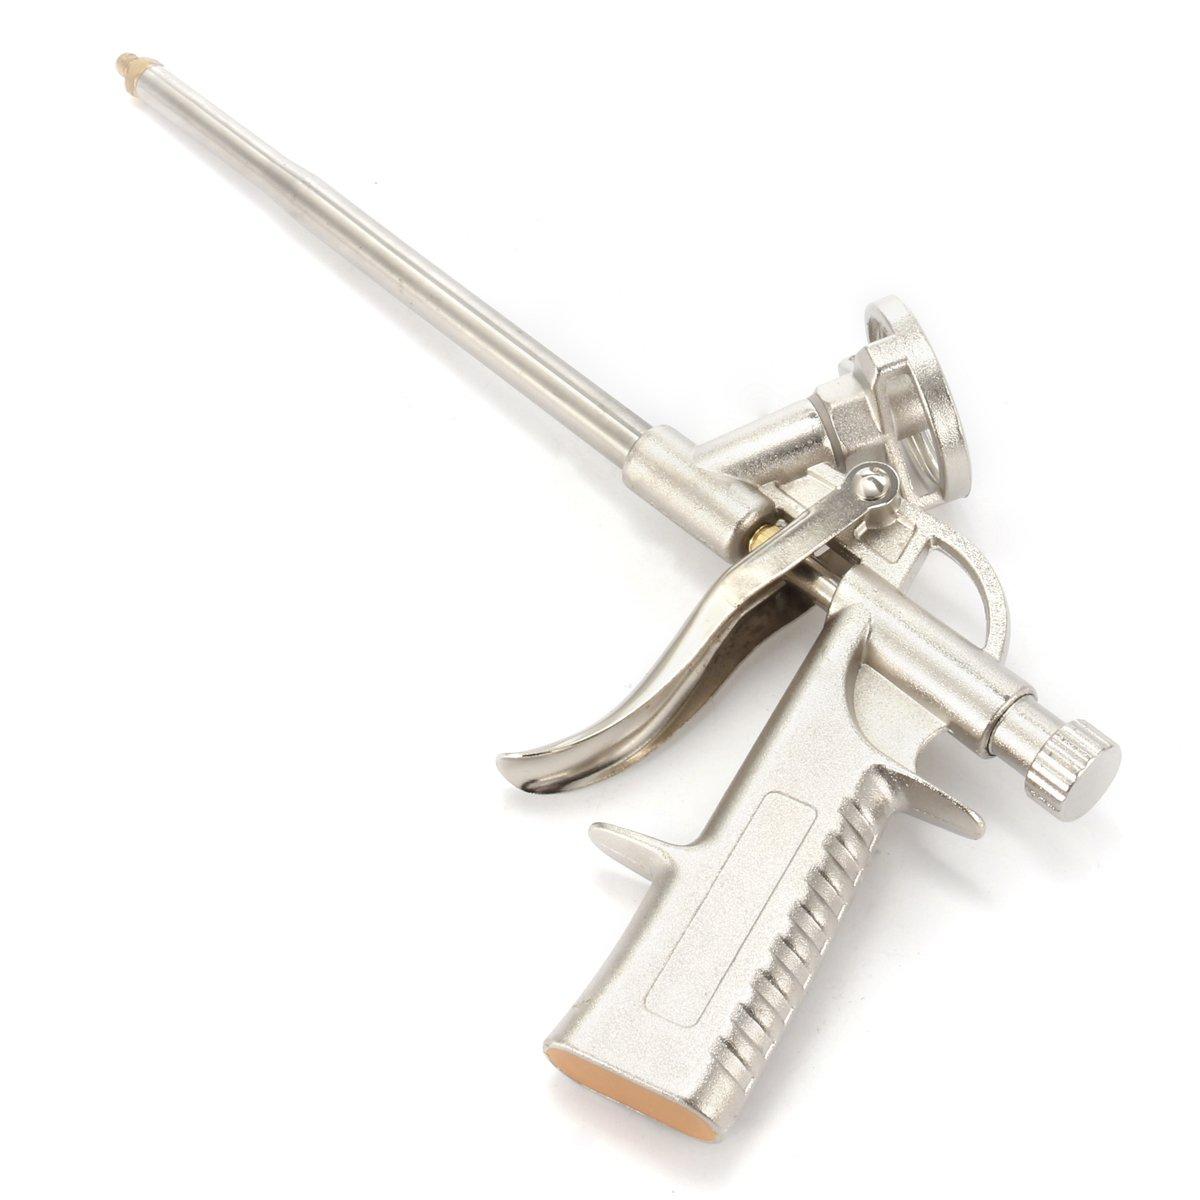 Yingte Foaming Gun,Professional All Metal Spray Foam Gun /Expanding Polyurethane Insulating Tool by Yingte (Image #1)